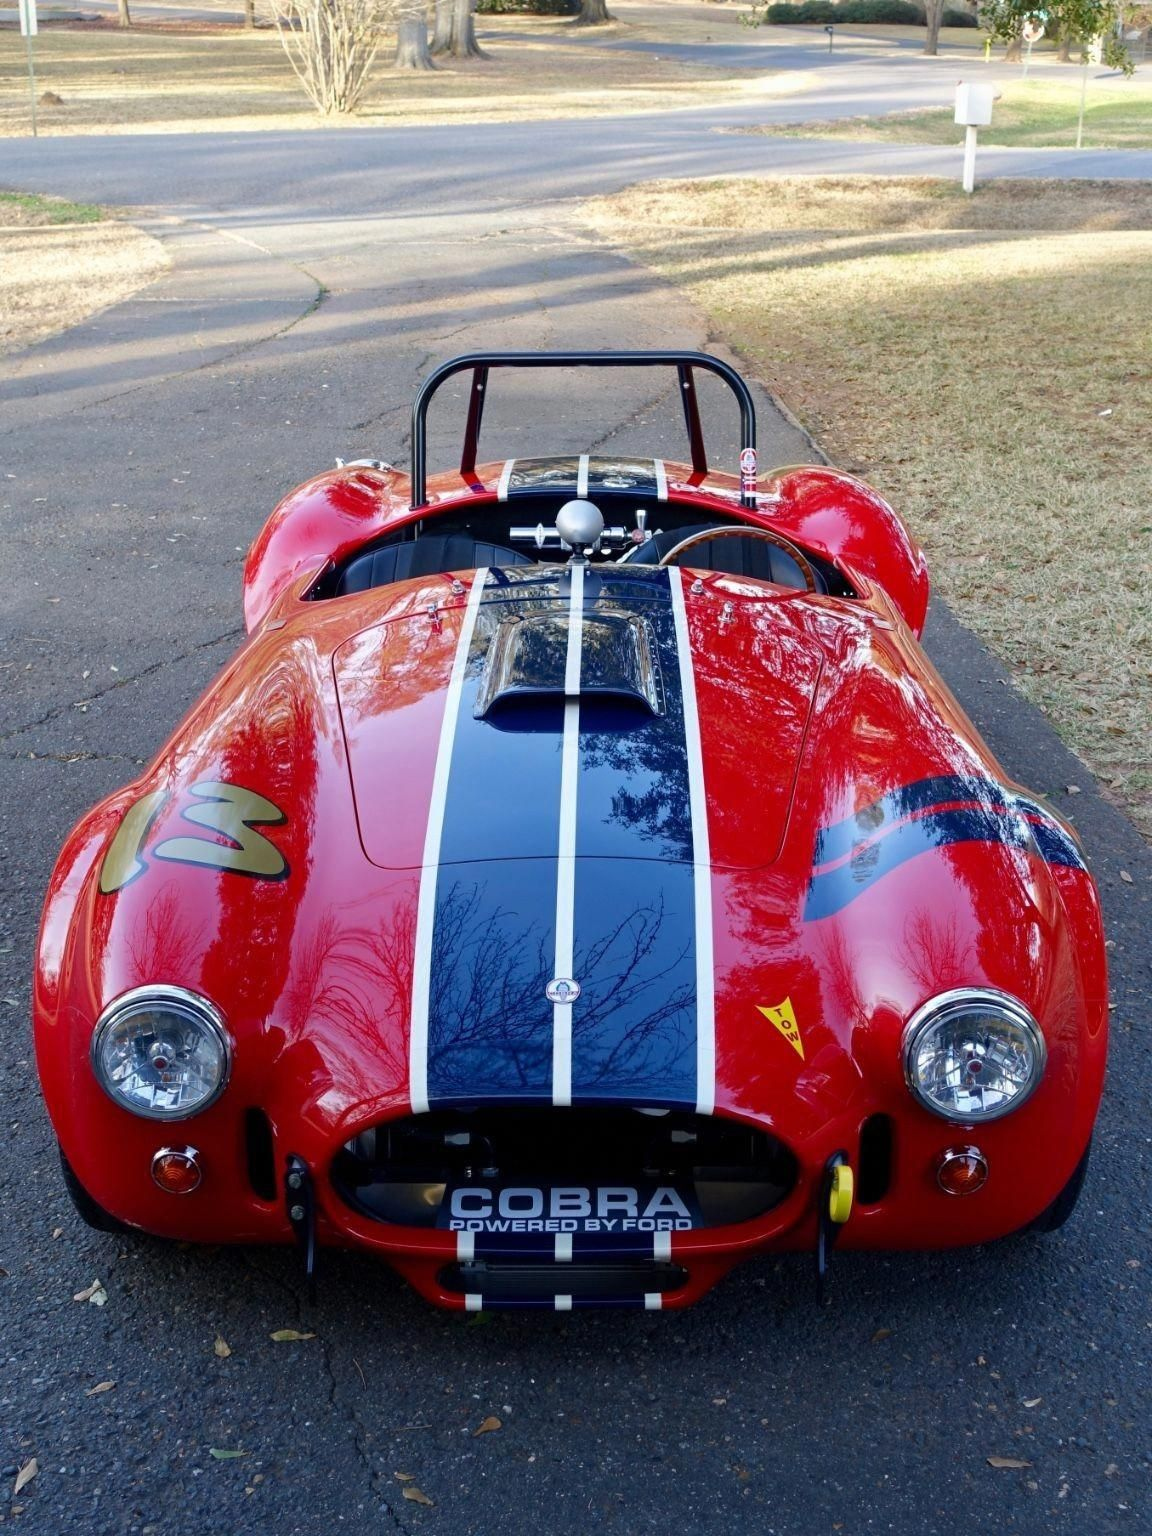 Mustang Cobra Dewa Poker Agen Poker Domino Bet Texas Poker Dewa Domino Poker Facebook Www Idsun88 Com Fordcla Super Cars Classic Cars 1965 Shelby Cobra